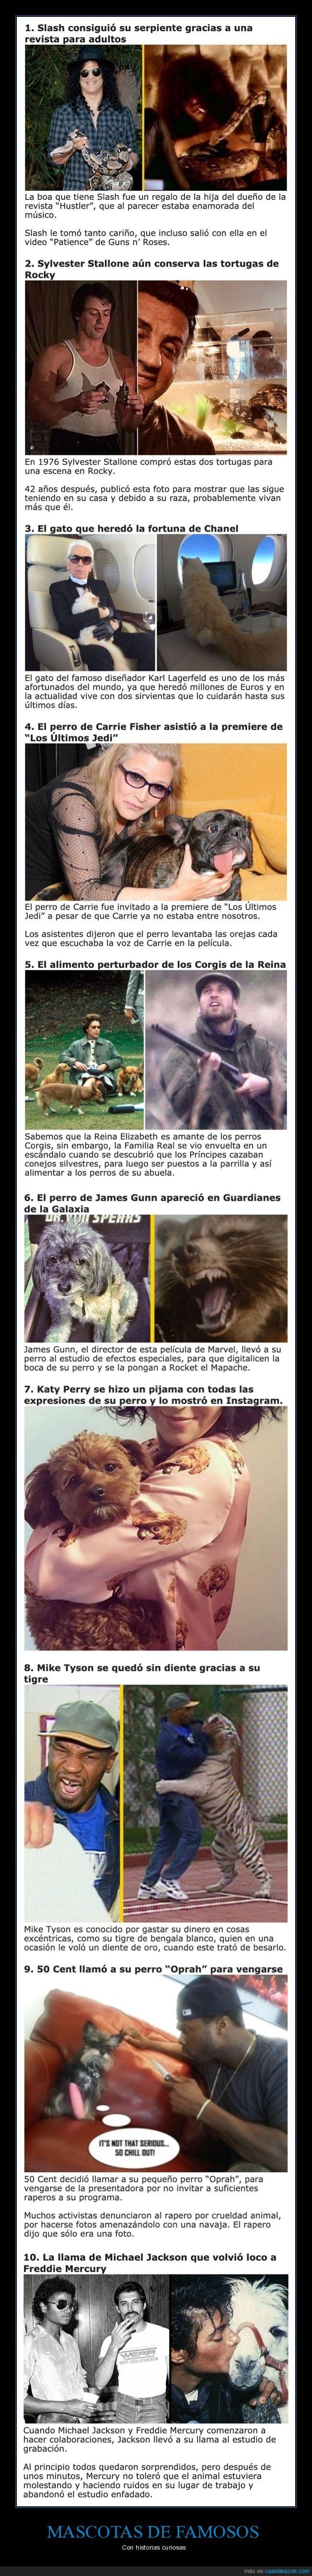 animales,famosos,mascotas